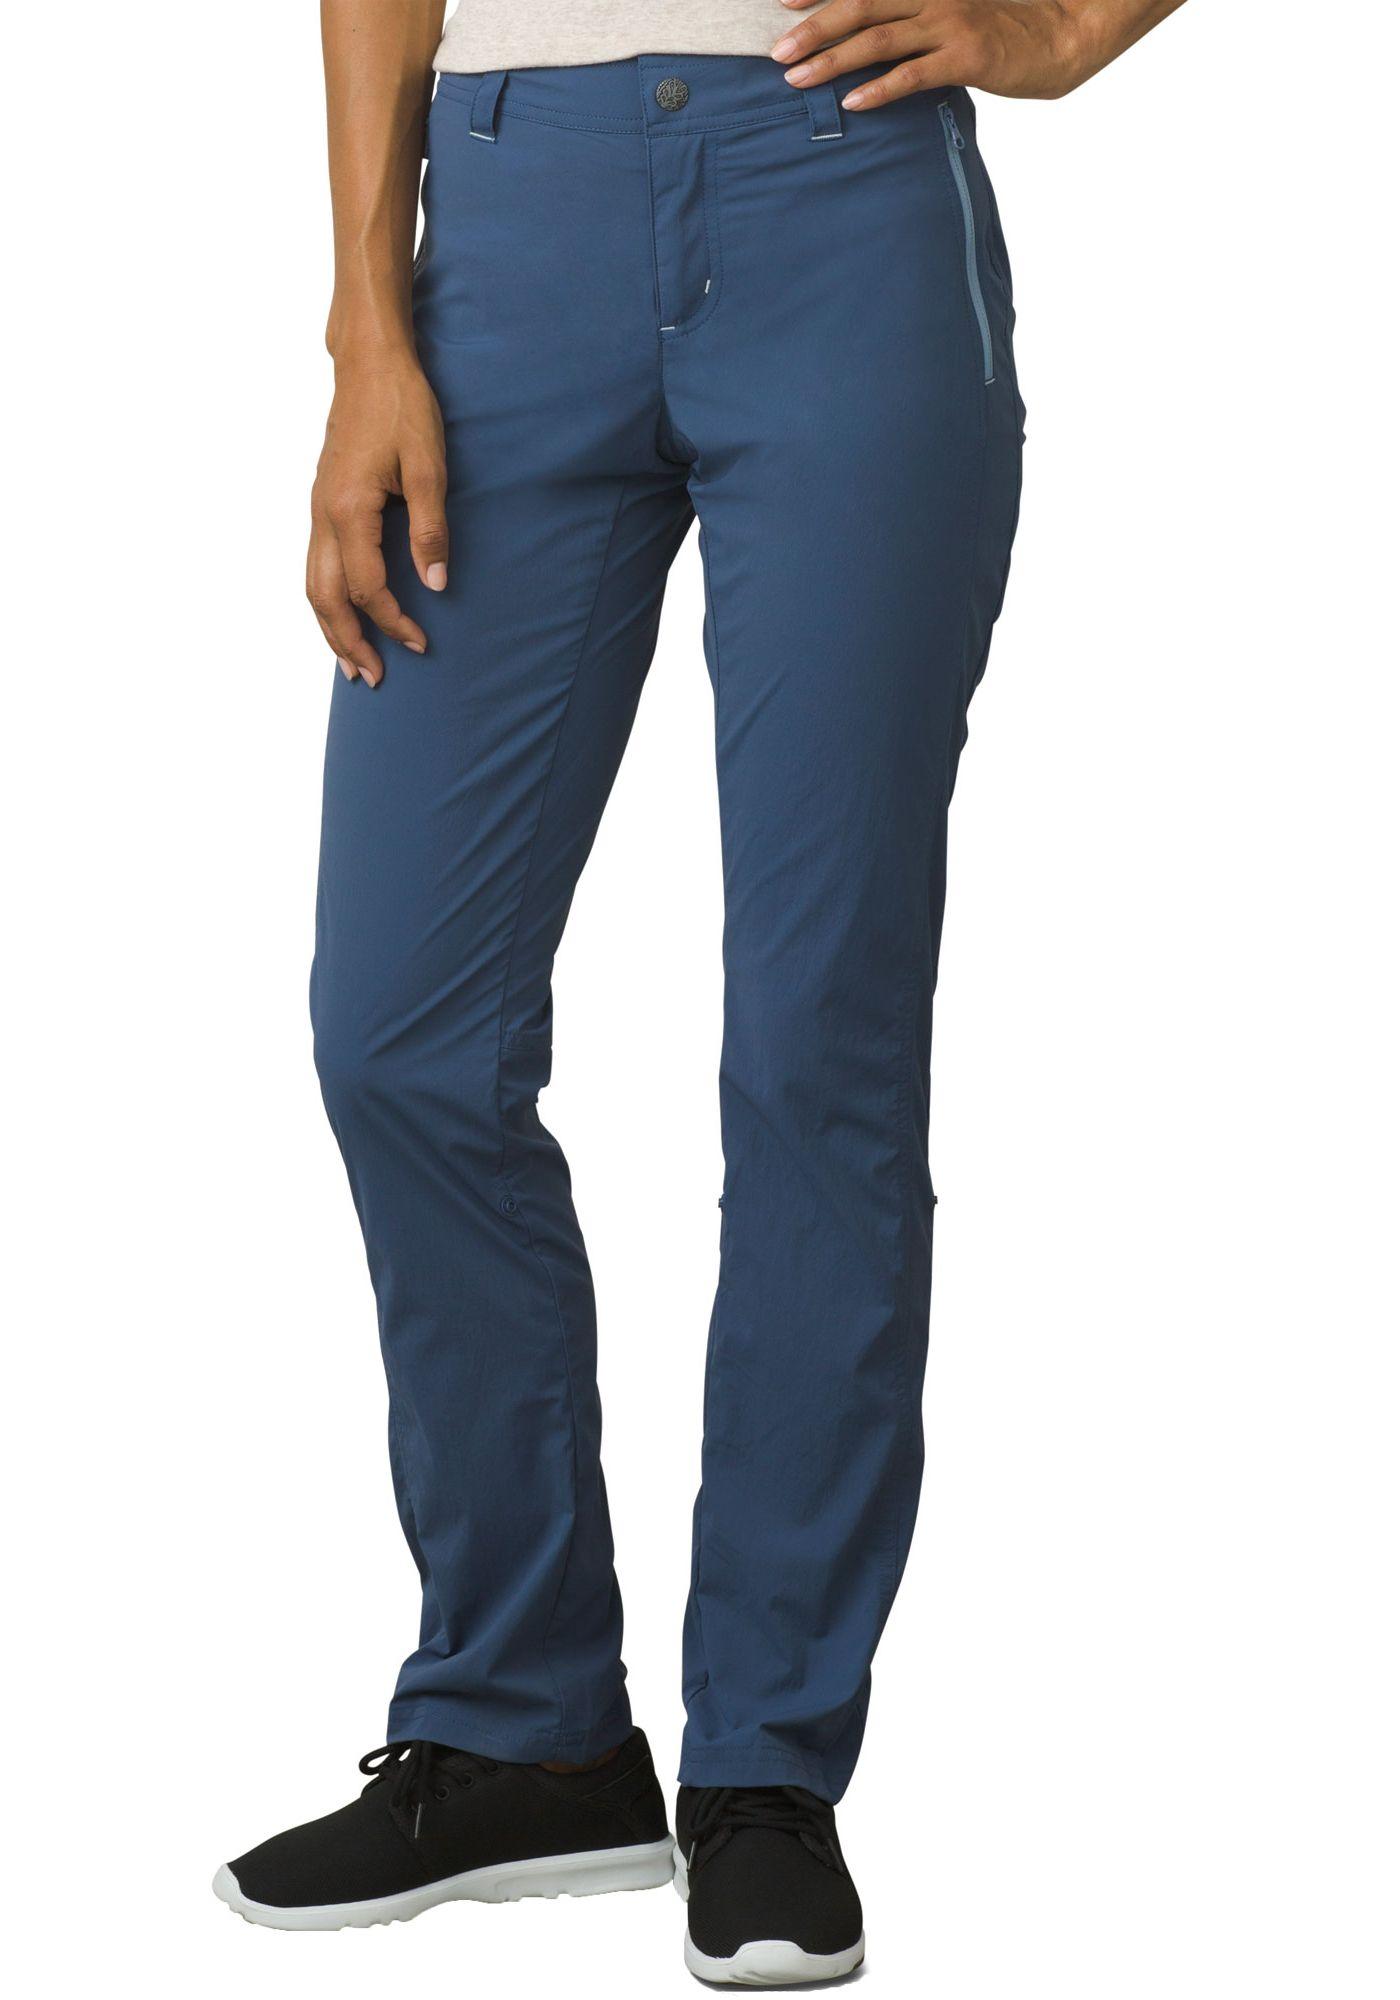 prAna Women's Aria Pants